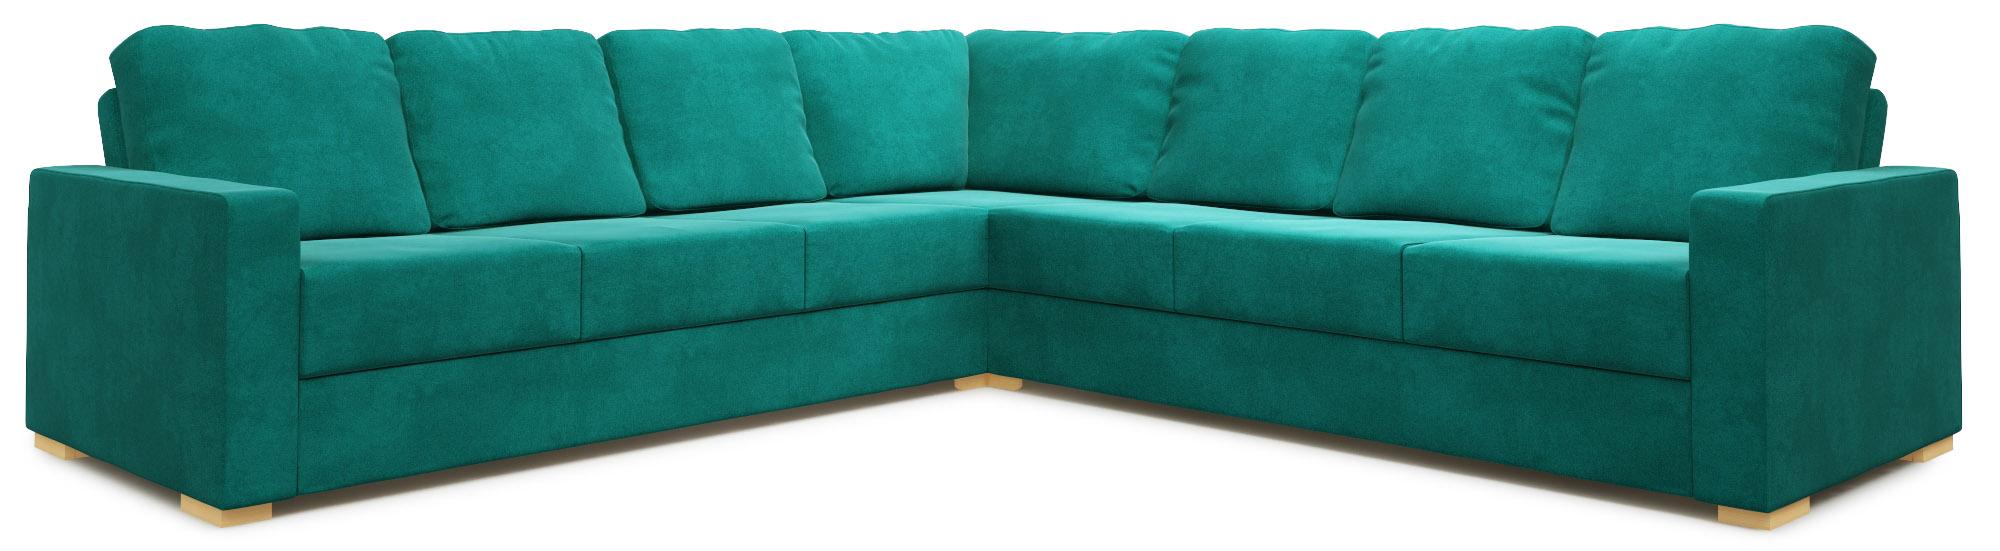 Lear 4X4 Corner Double Sofa Bed